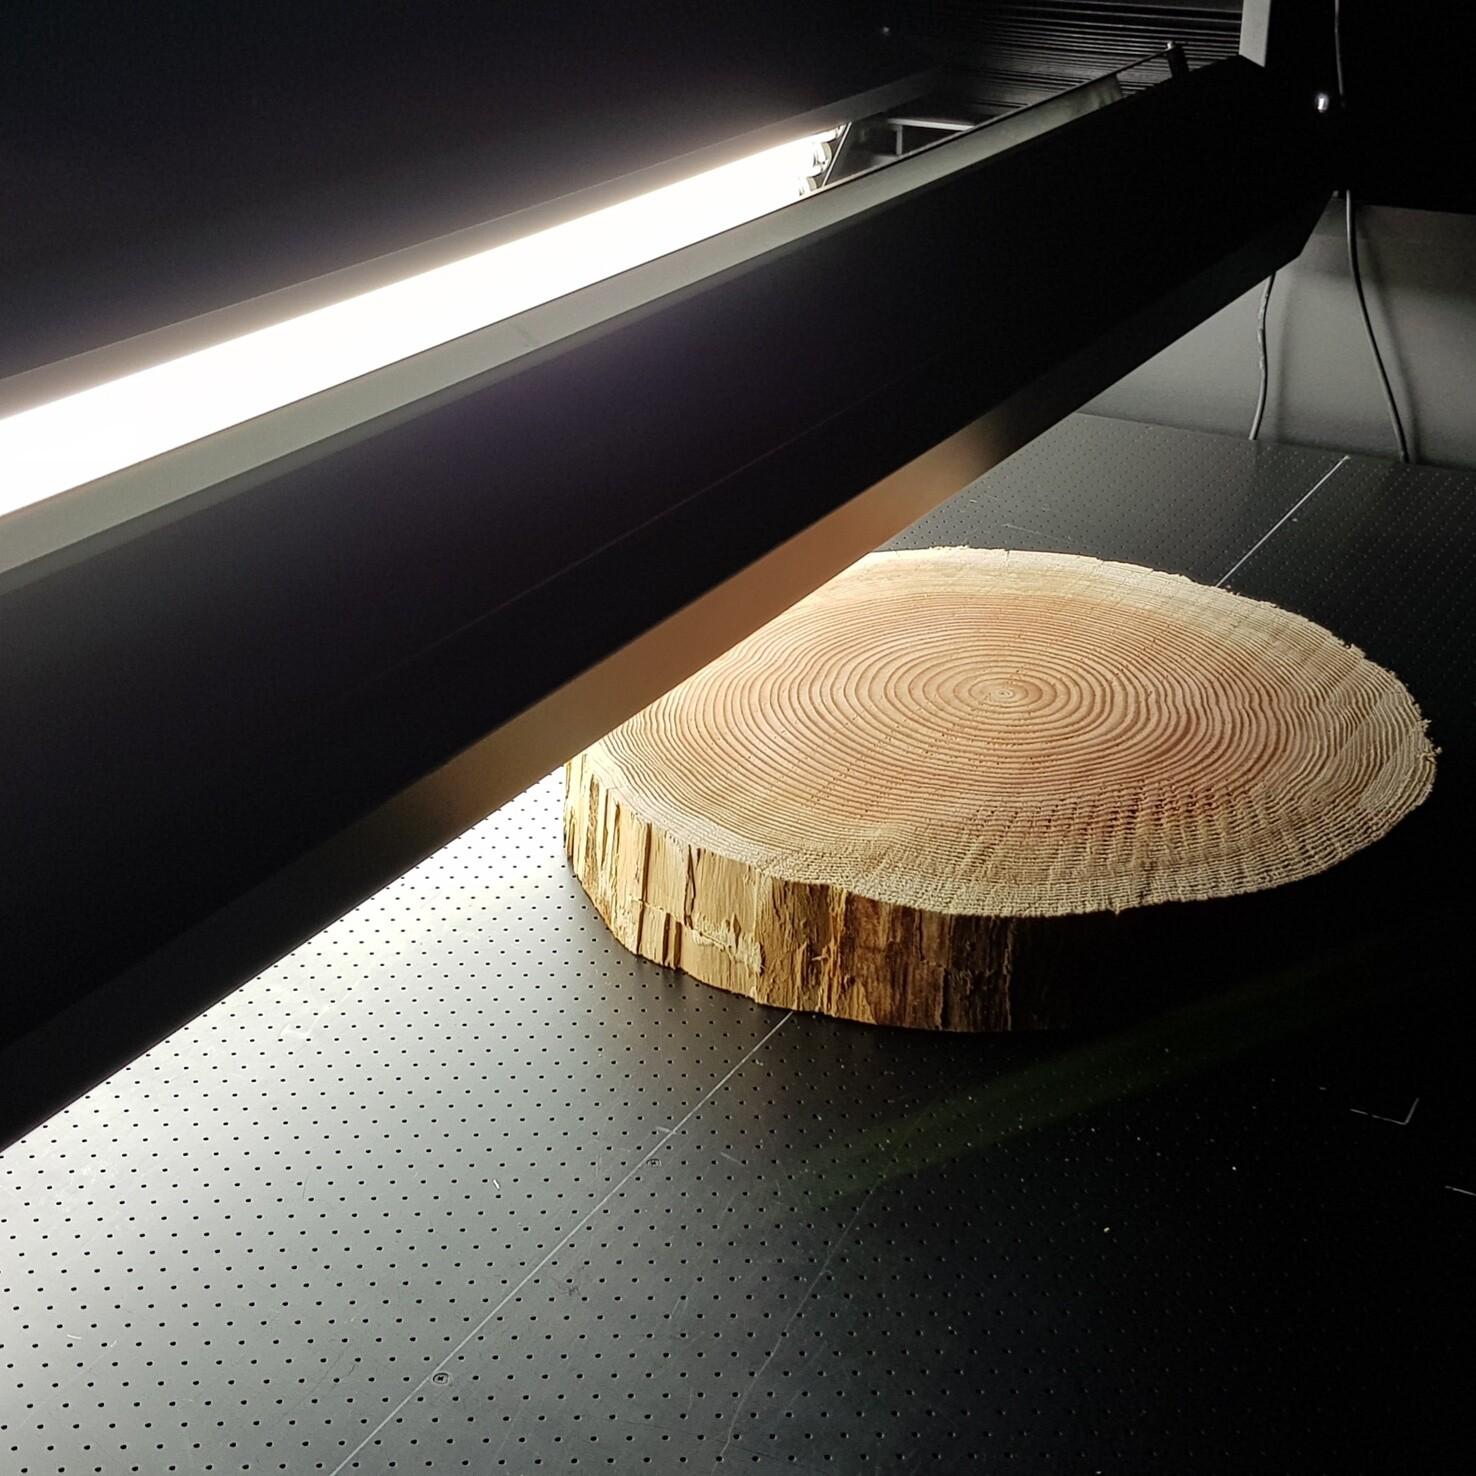 Holzscheibe - Scan